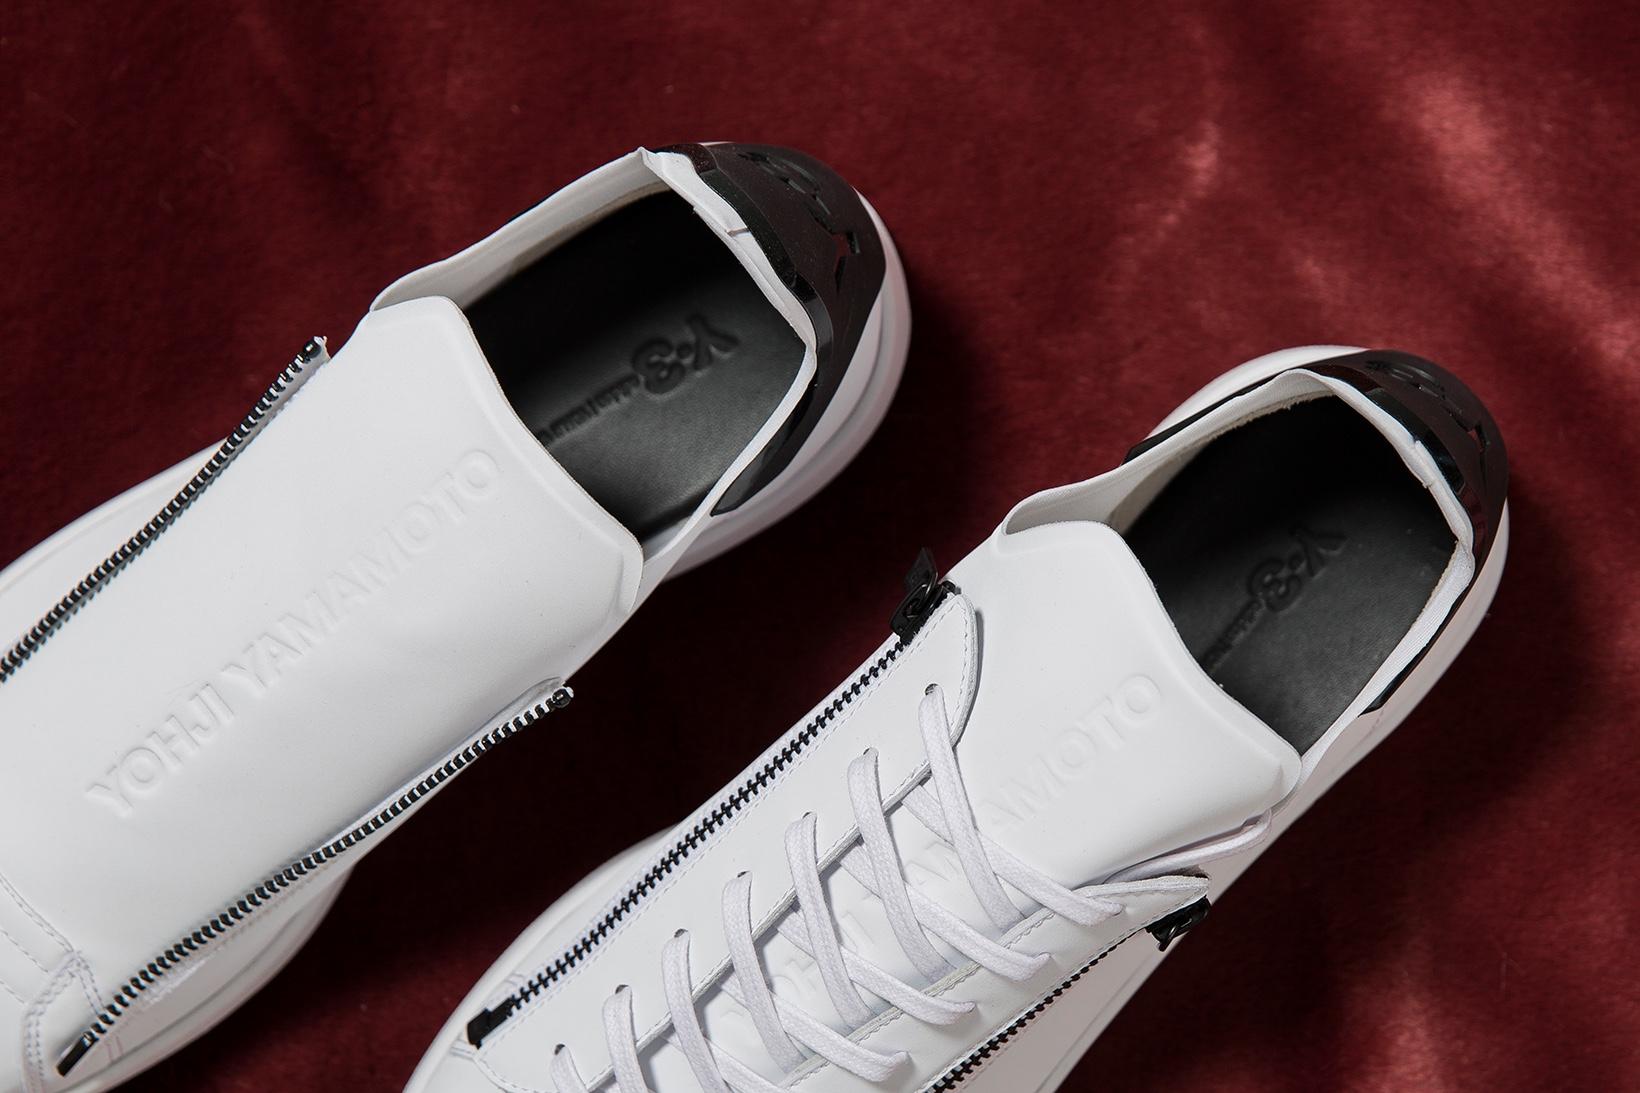 competitive price 4271e 9e693 adidas y3 stan smith zip